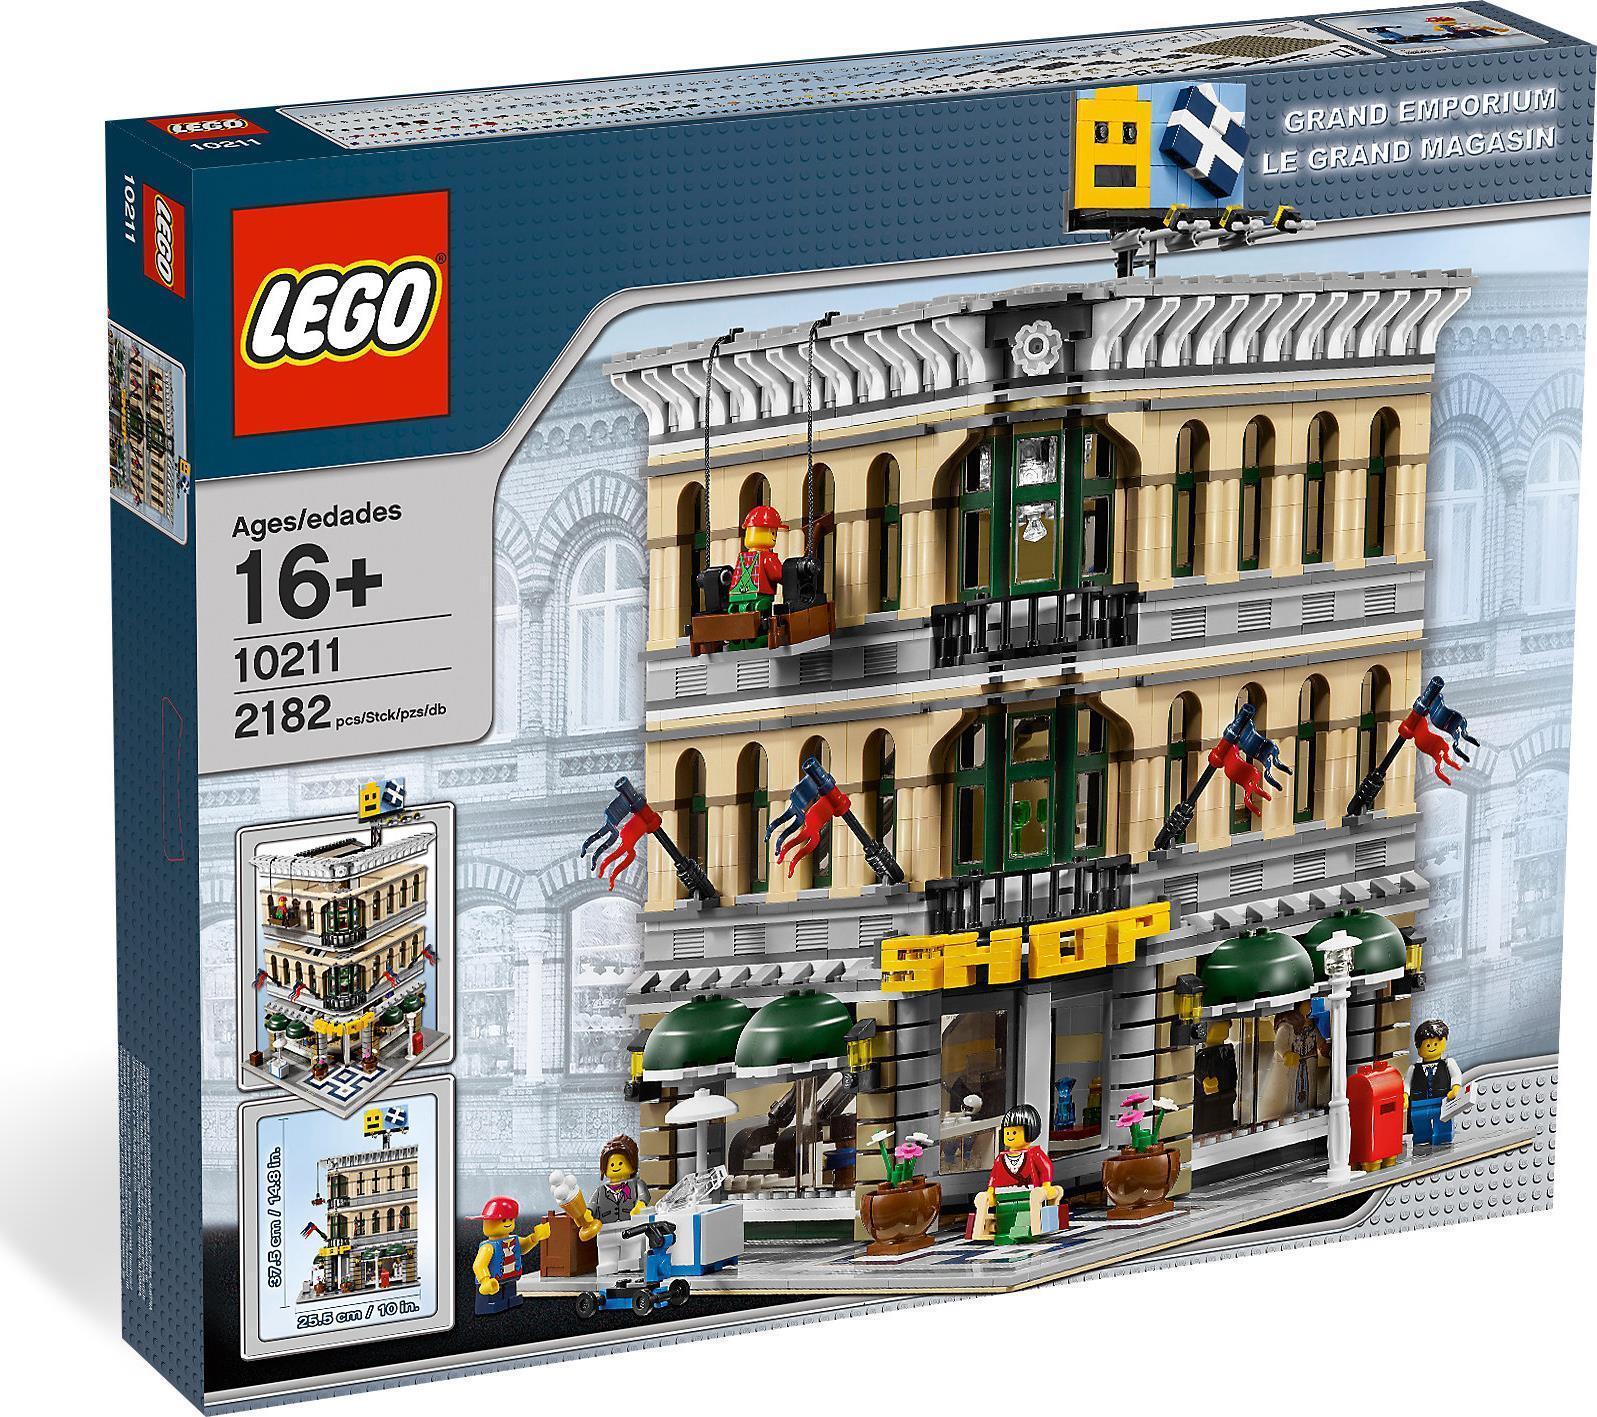 Lego Sammler modulare Schöpfer 10211 - Grand EMPORIUM Neu Neu Neu versiegelt seltene 73f130